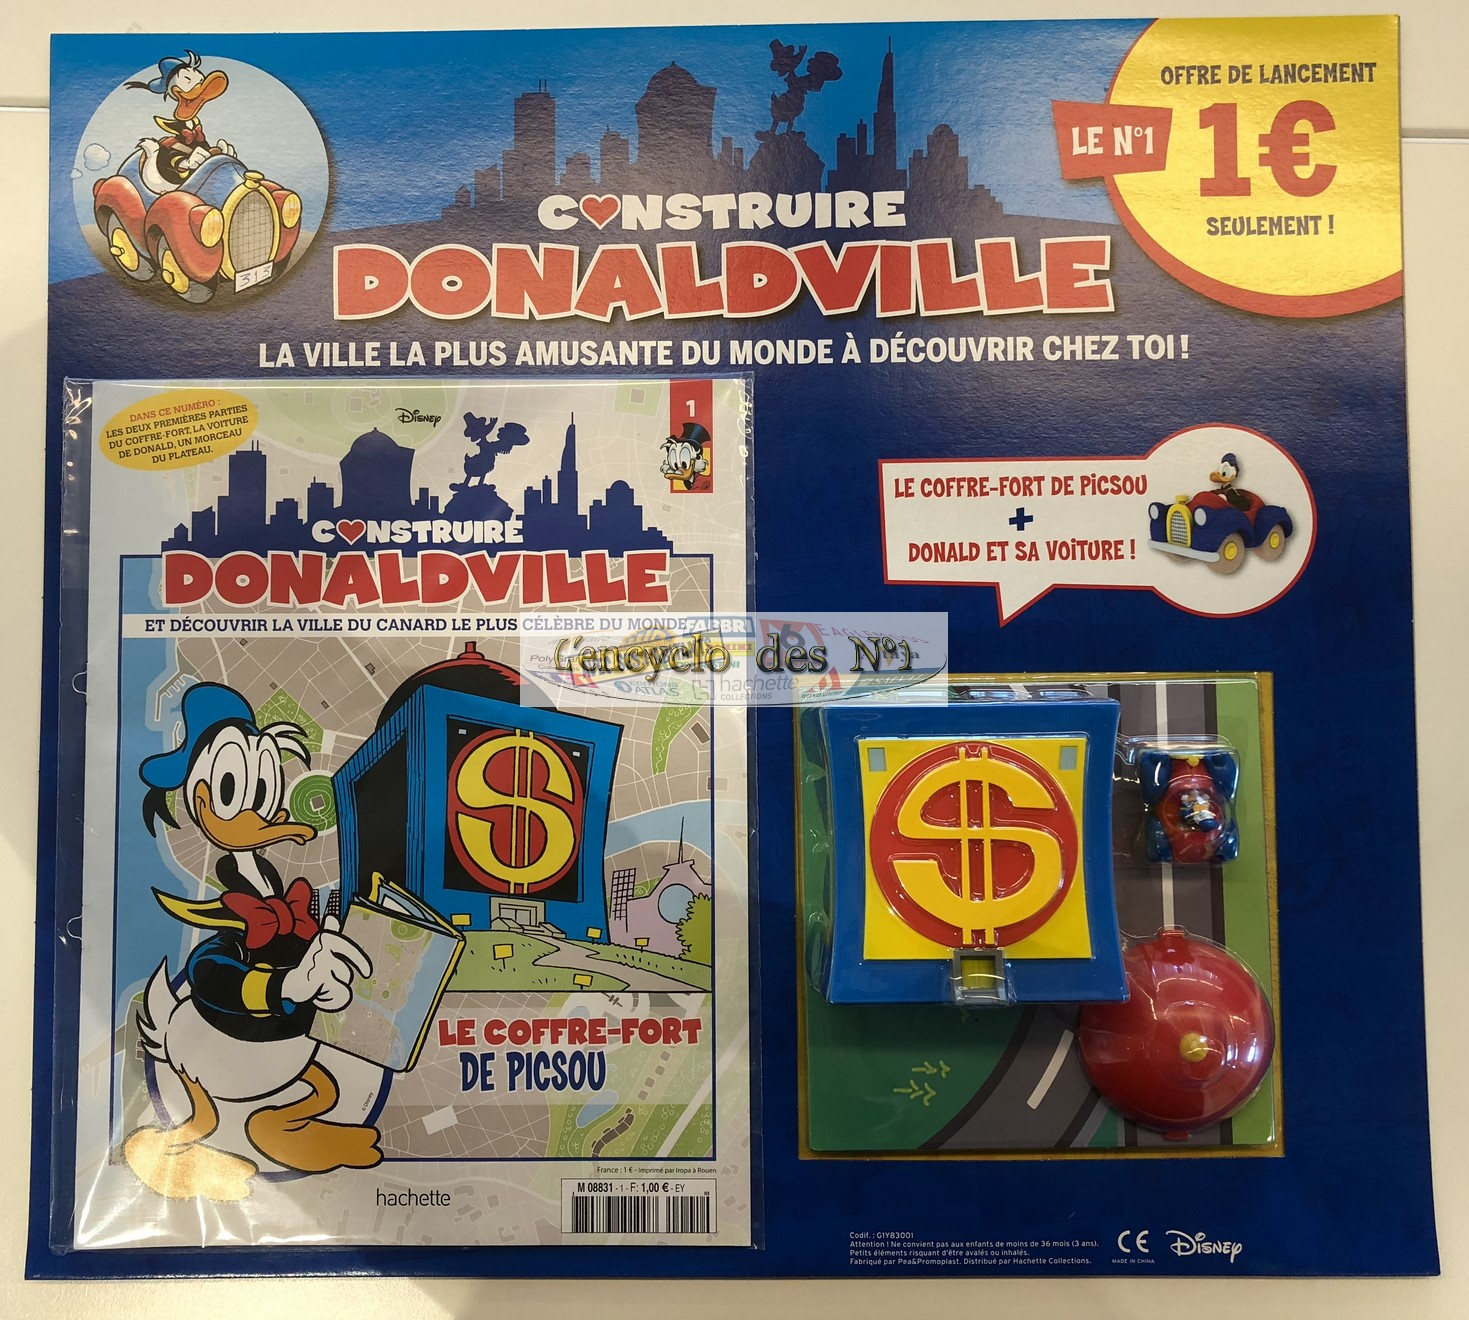 [Collection Press] N° 1 Construire Donaldville - Test Hachette - 09/2018 UvkBapl9EAUqLsyDNOr4Z2gvIyk